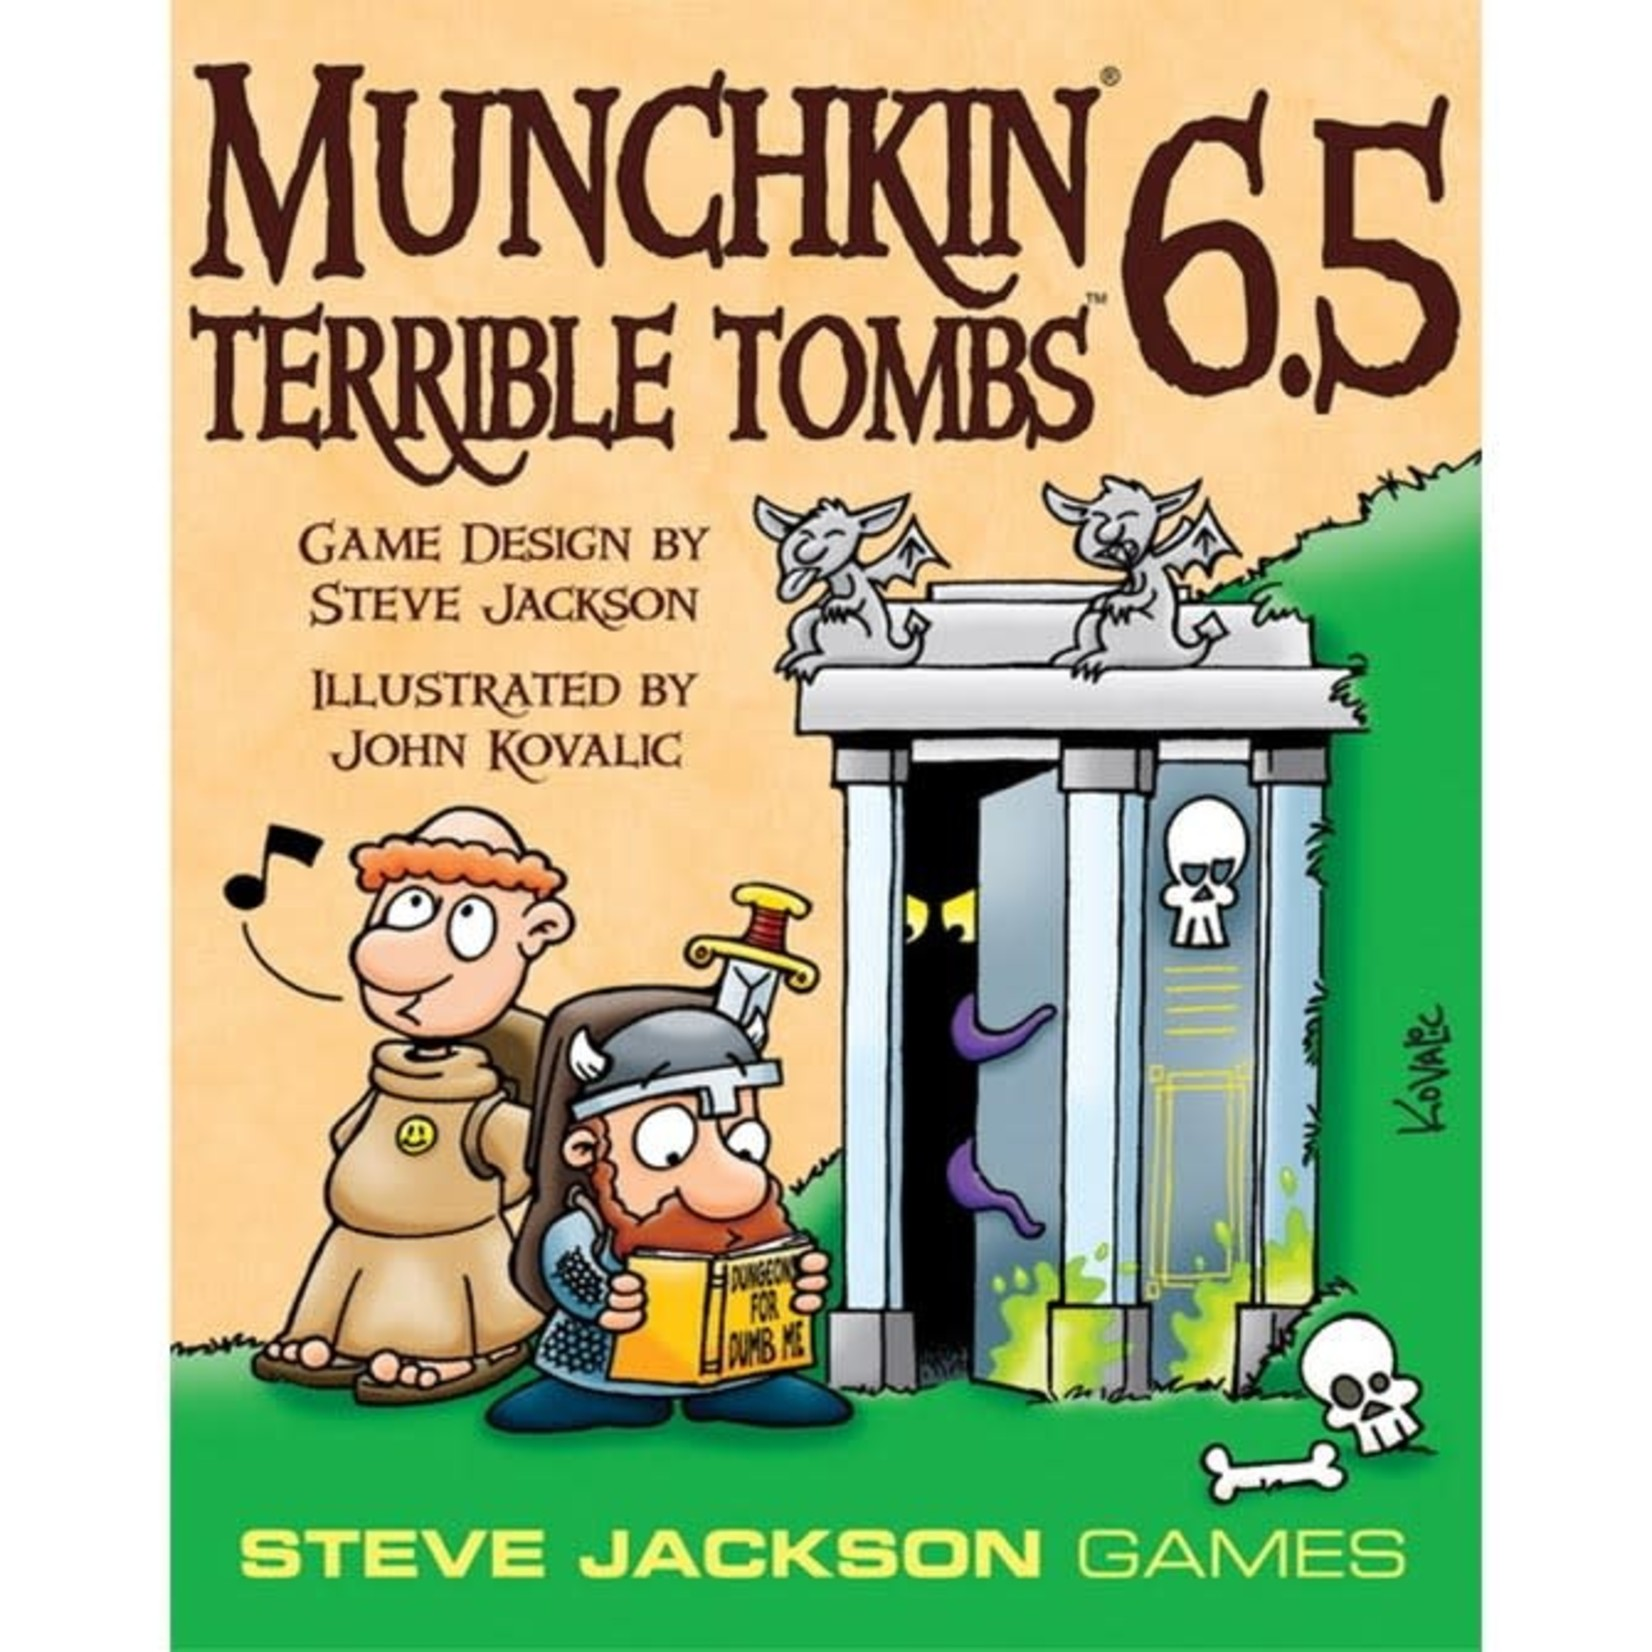 Steve Jackson Games Munchkin: 6.5 Terrible Tombs